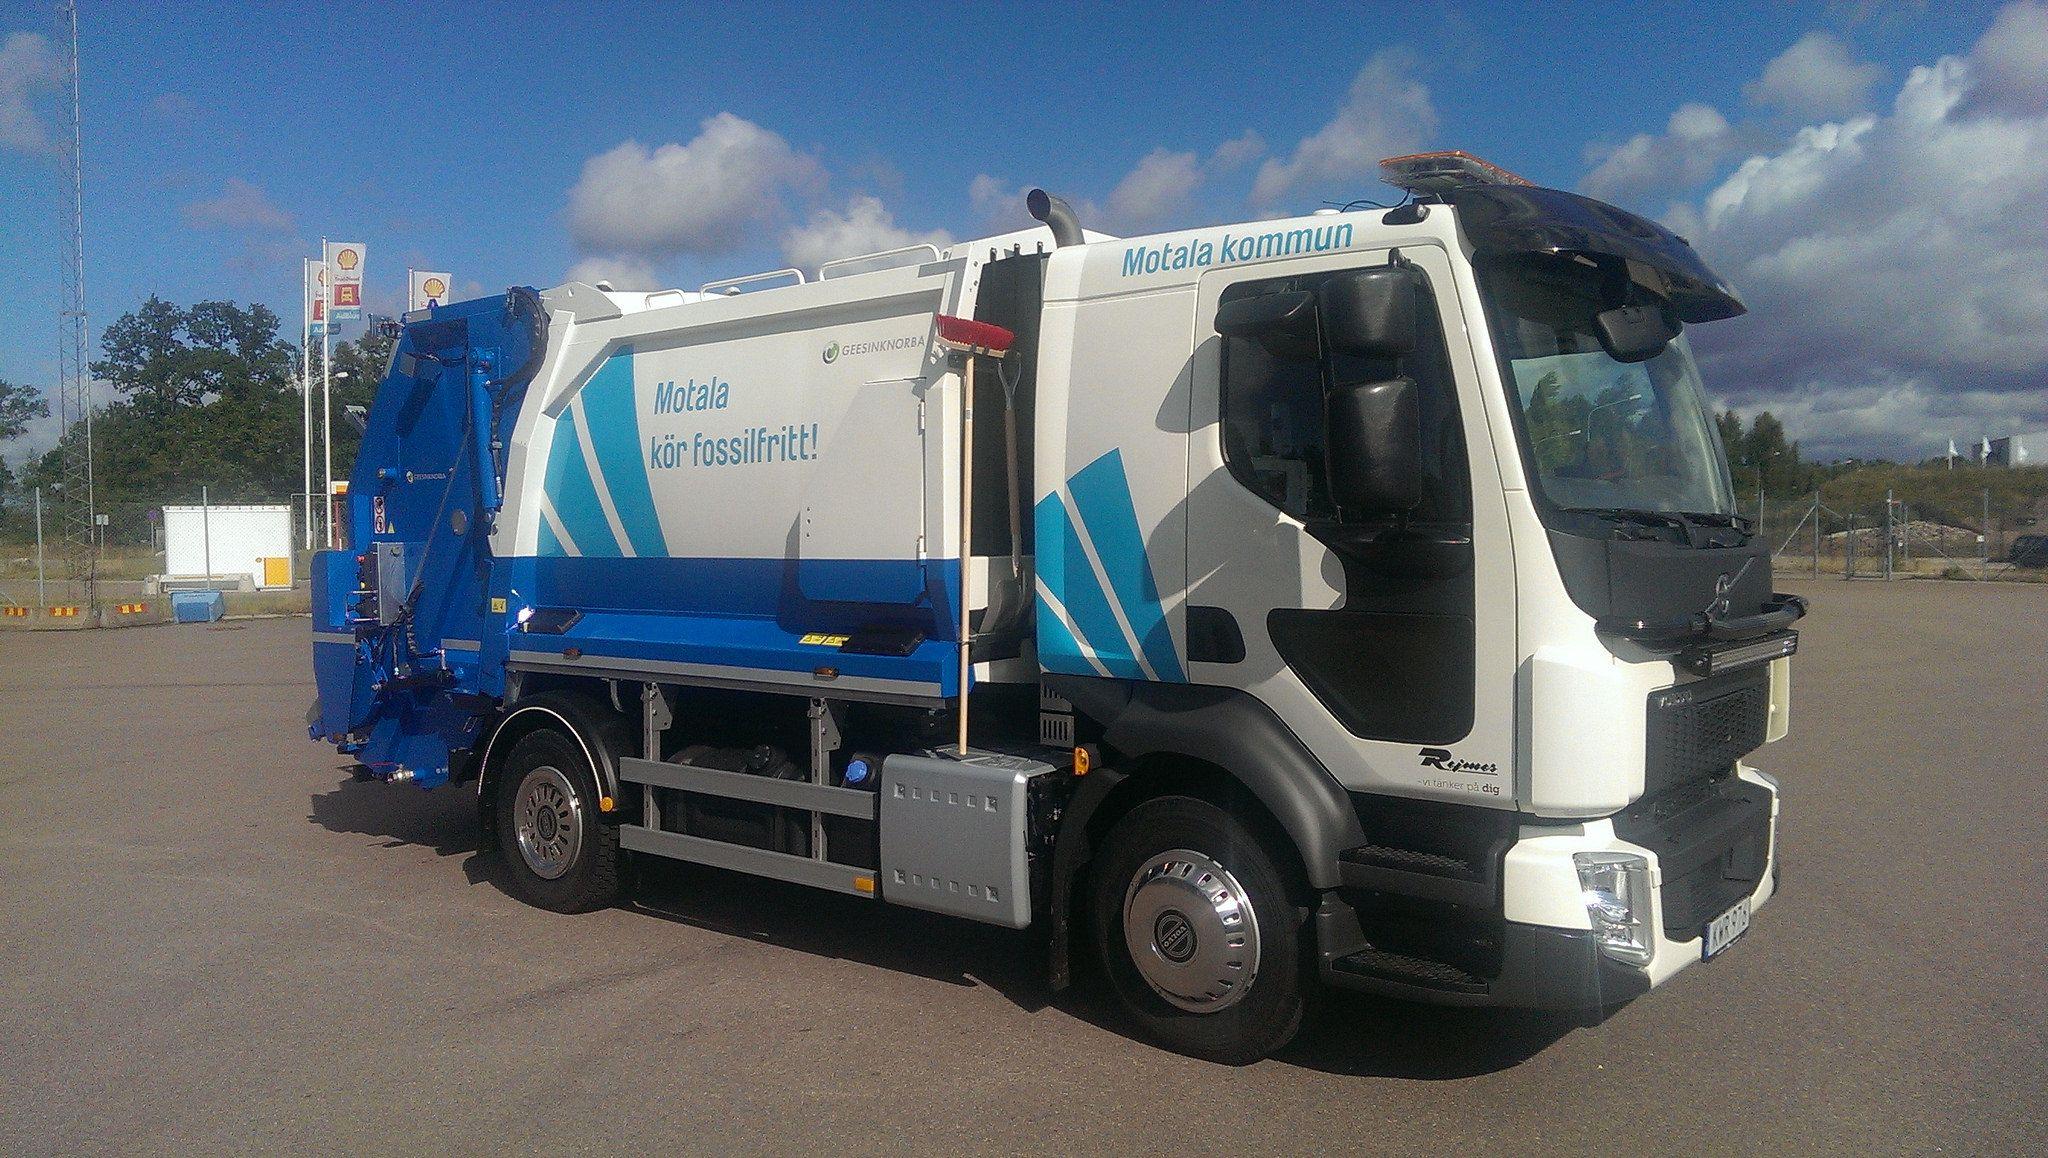 Motala Kommun Garbage Truck Trucks Trash Collector